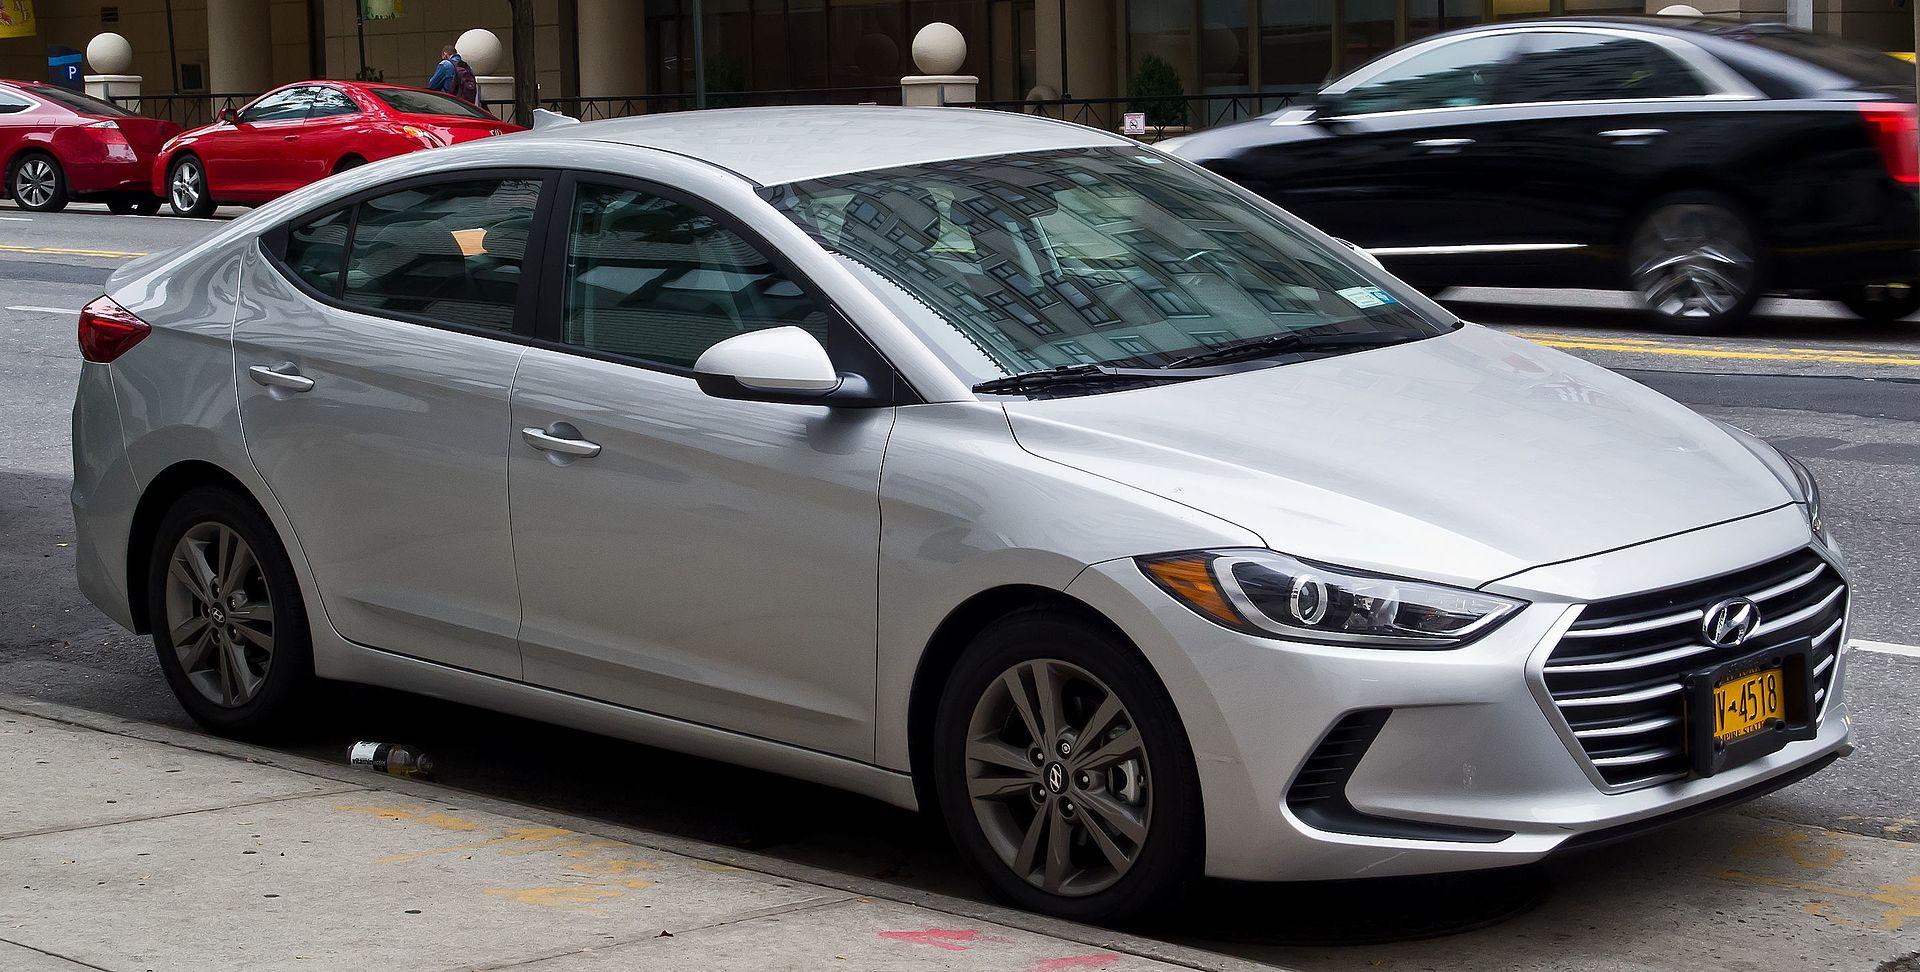 Hyundai Elantra SE 2.0 (VI) – Frontansicht, 2. Oktober 2016, New York.jpg